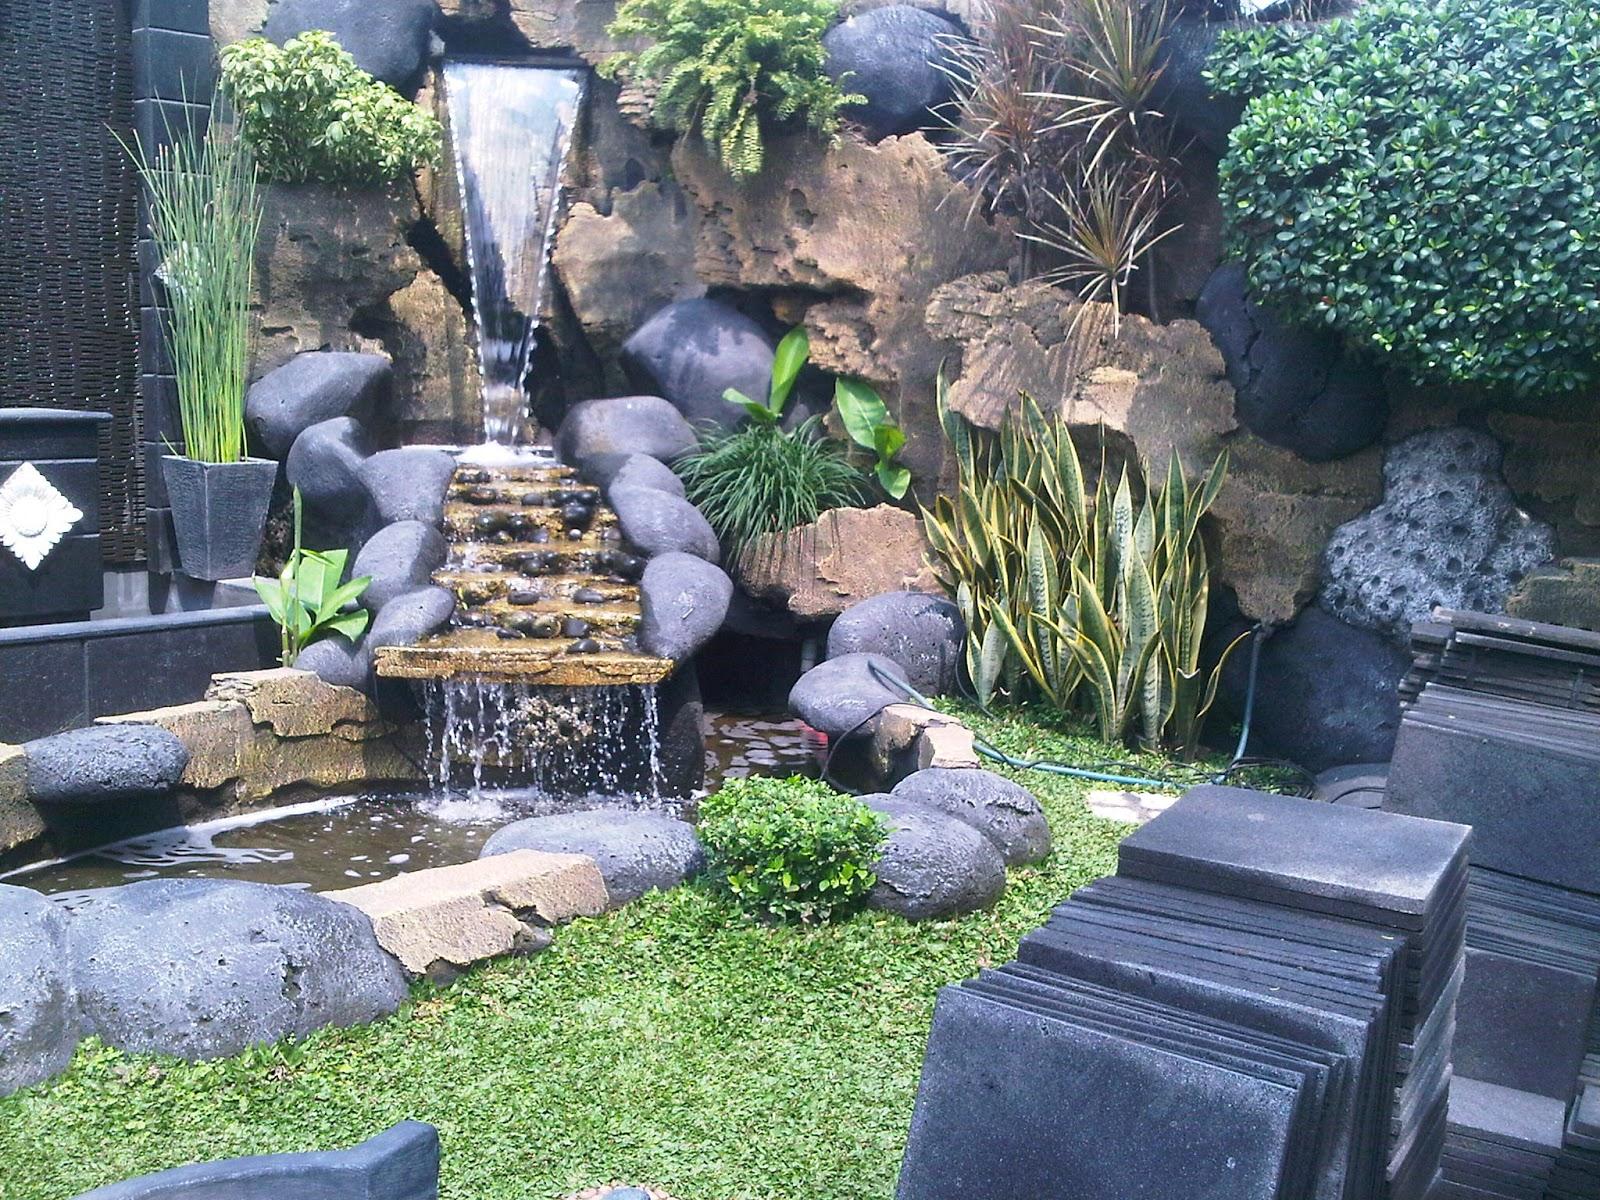 Tukang Taman Mojokerto Garden Style Tukang Taman Surabaya